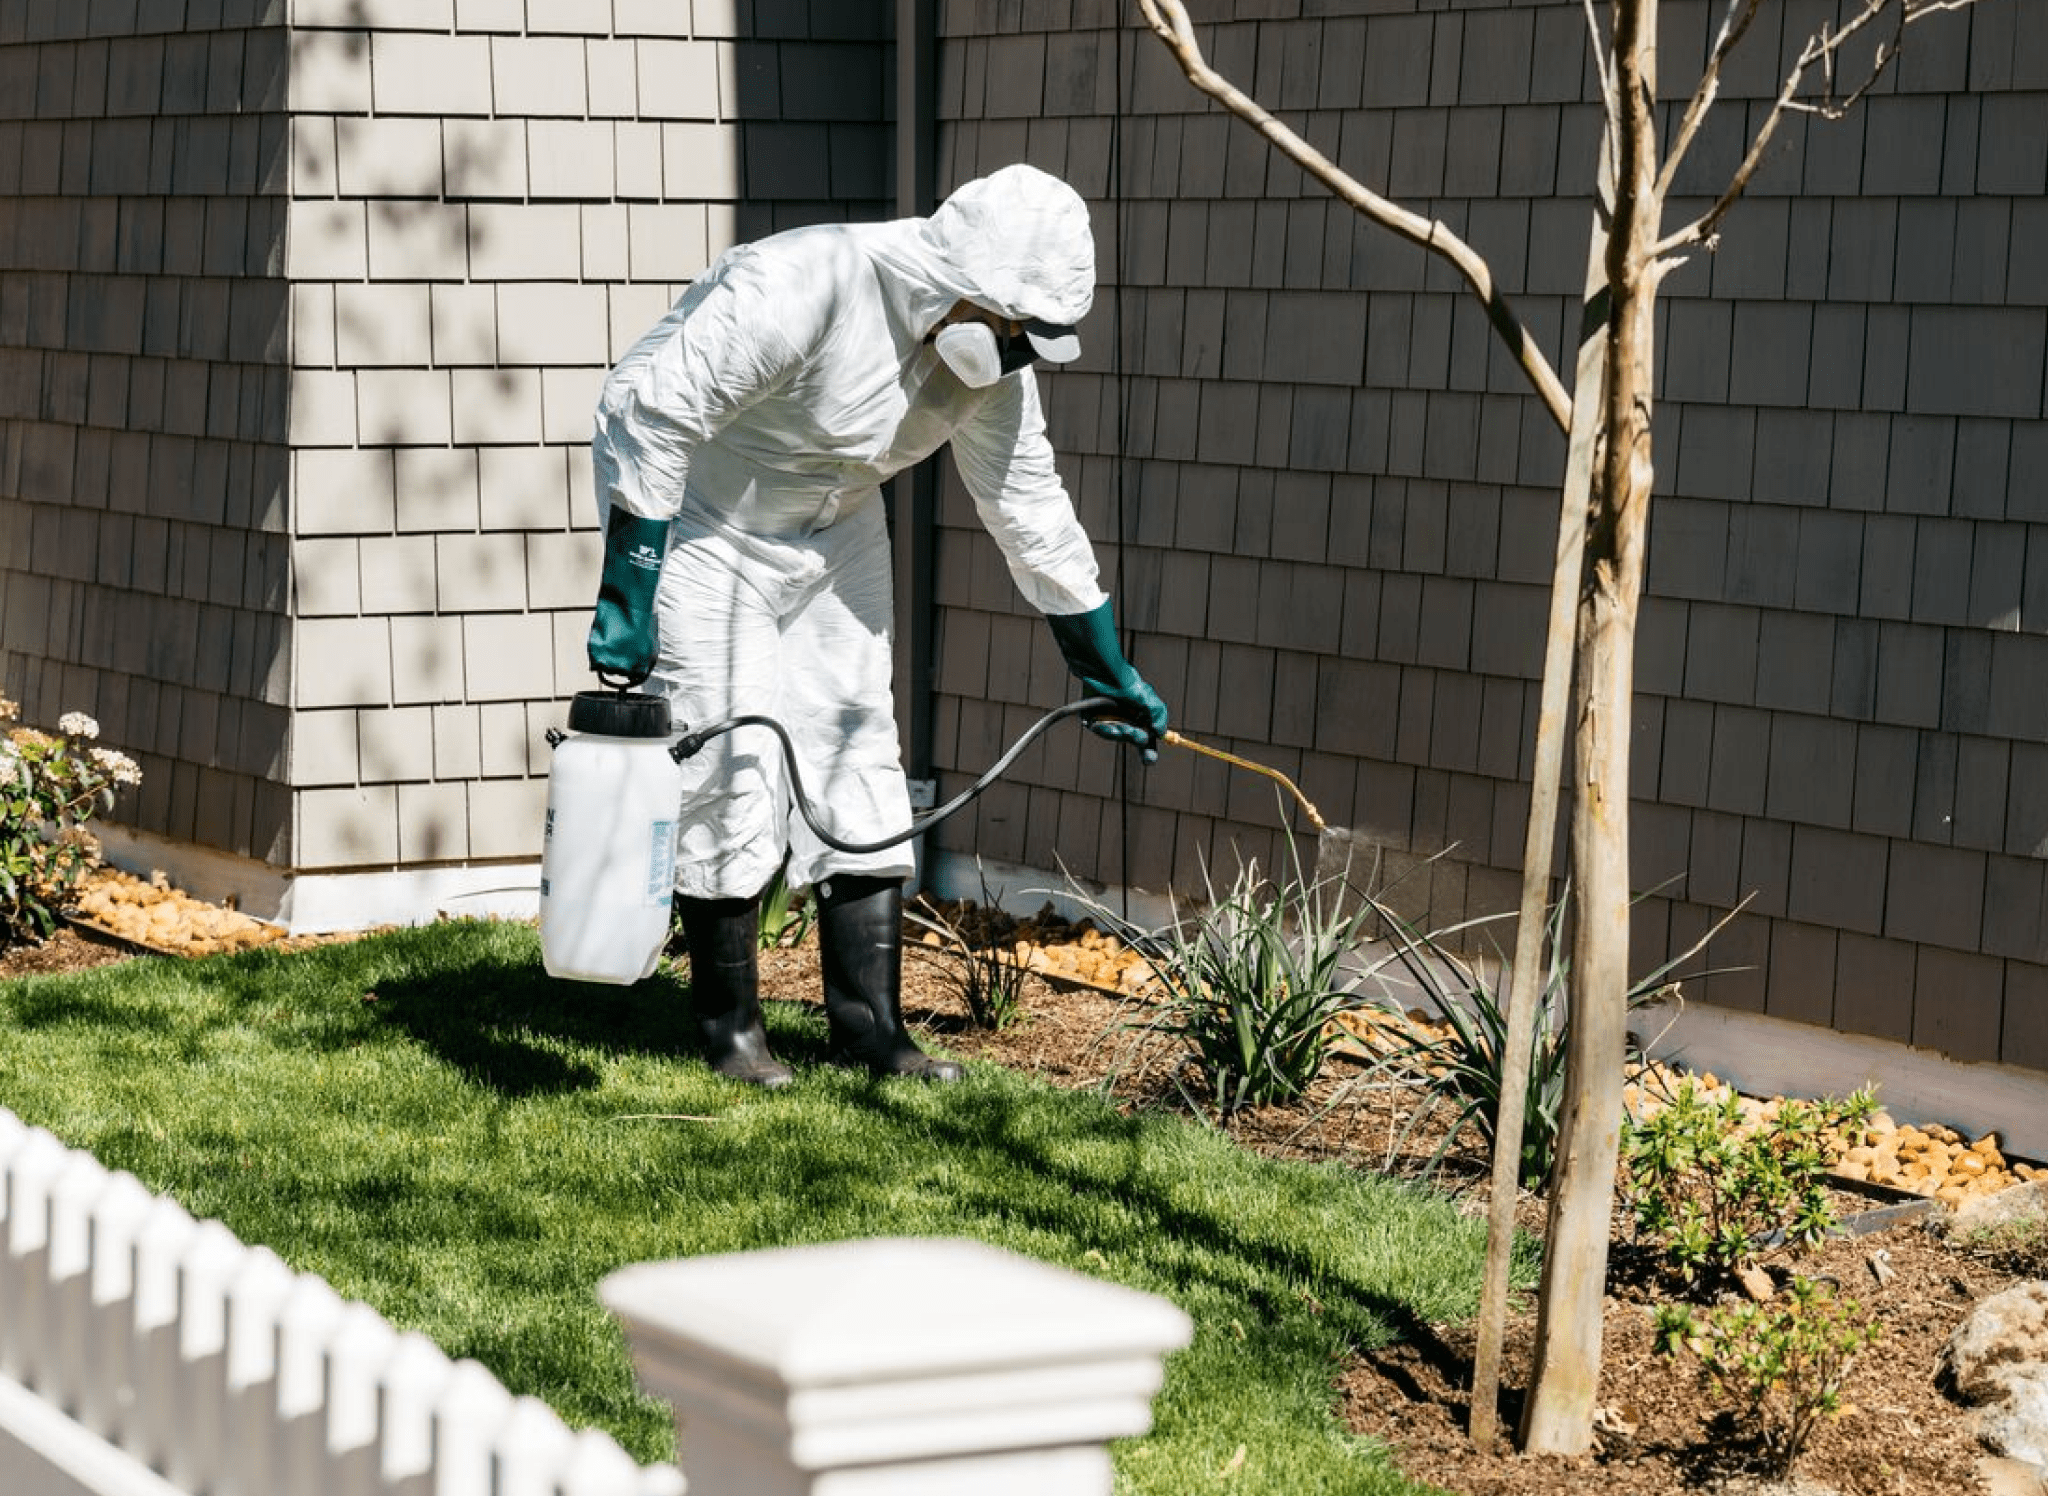 applying outdoor pesticide